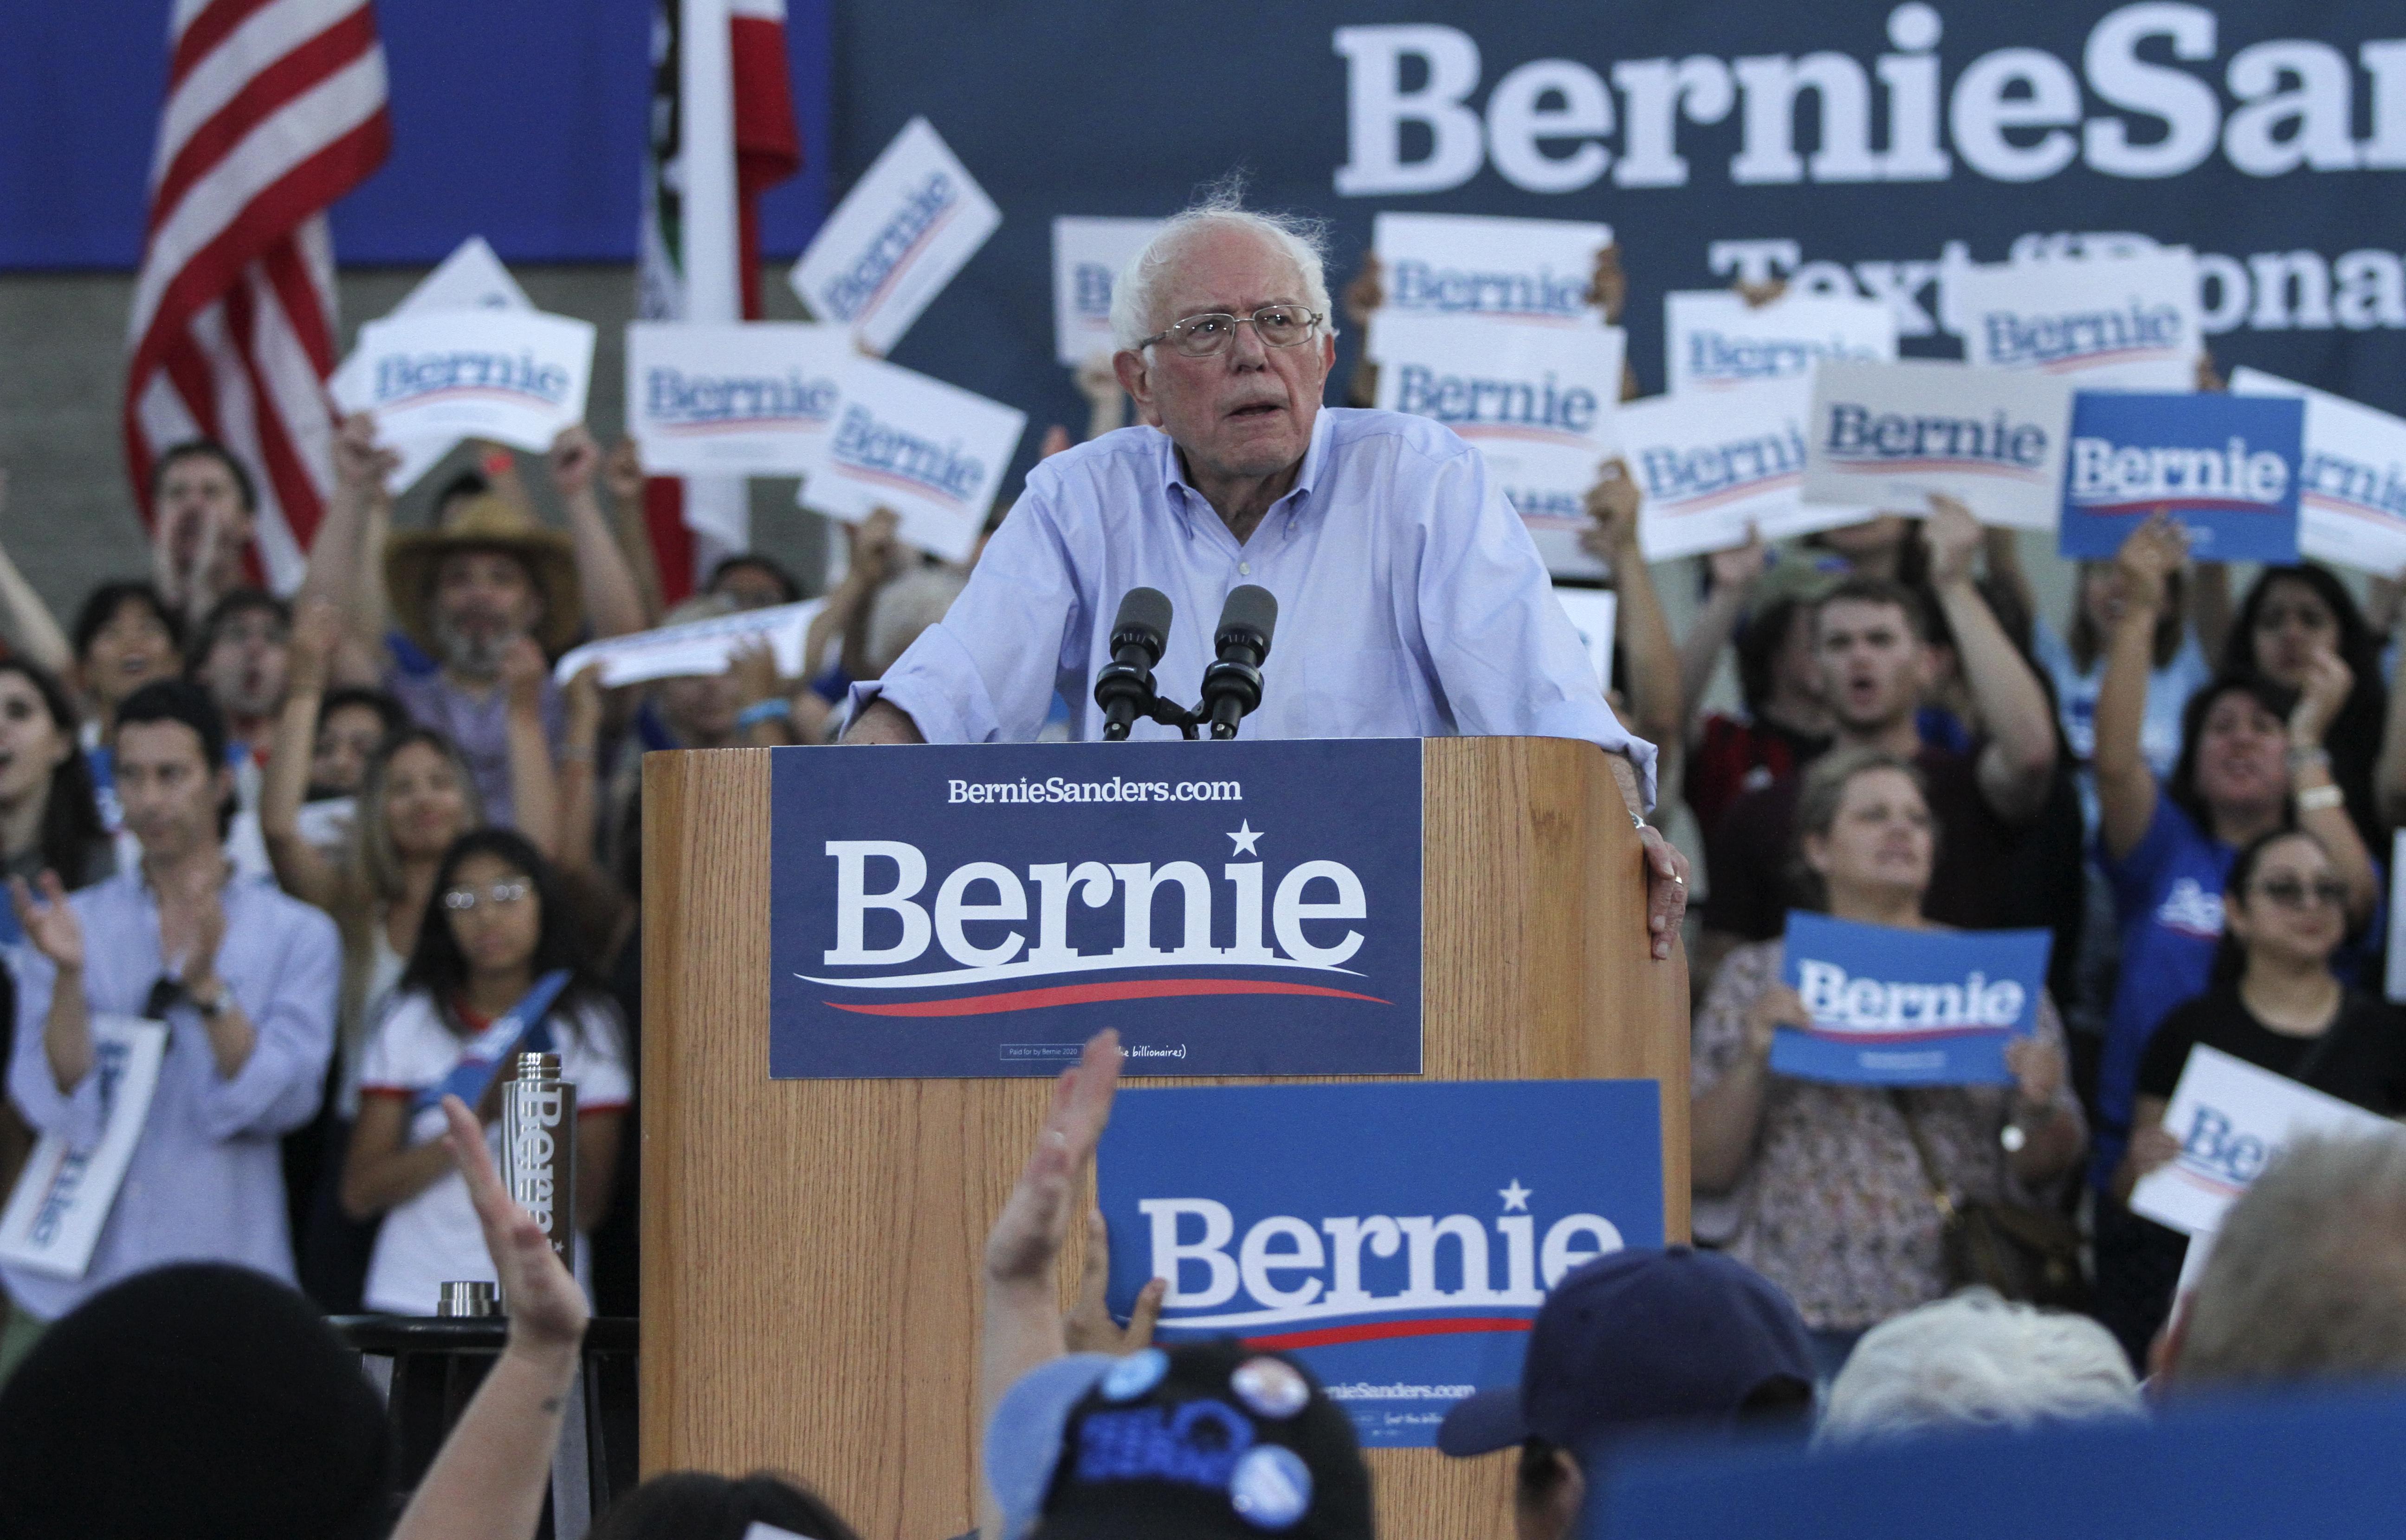 Lbcc Summer 2020.Presidential Candidate Bernie Sanders Is Coming To Long